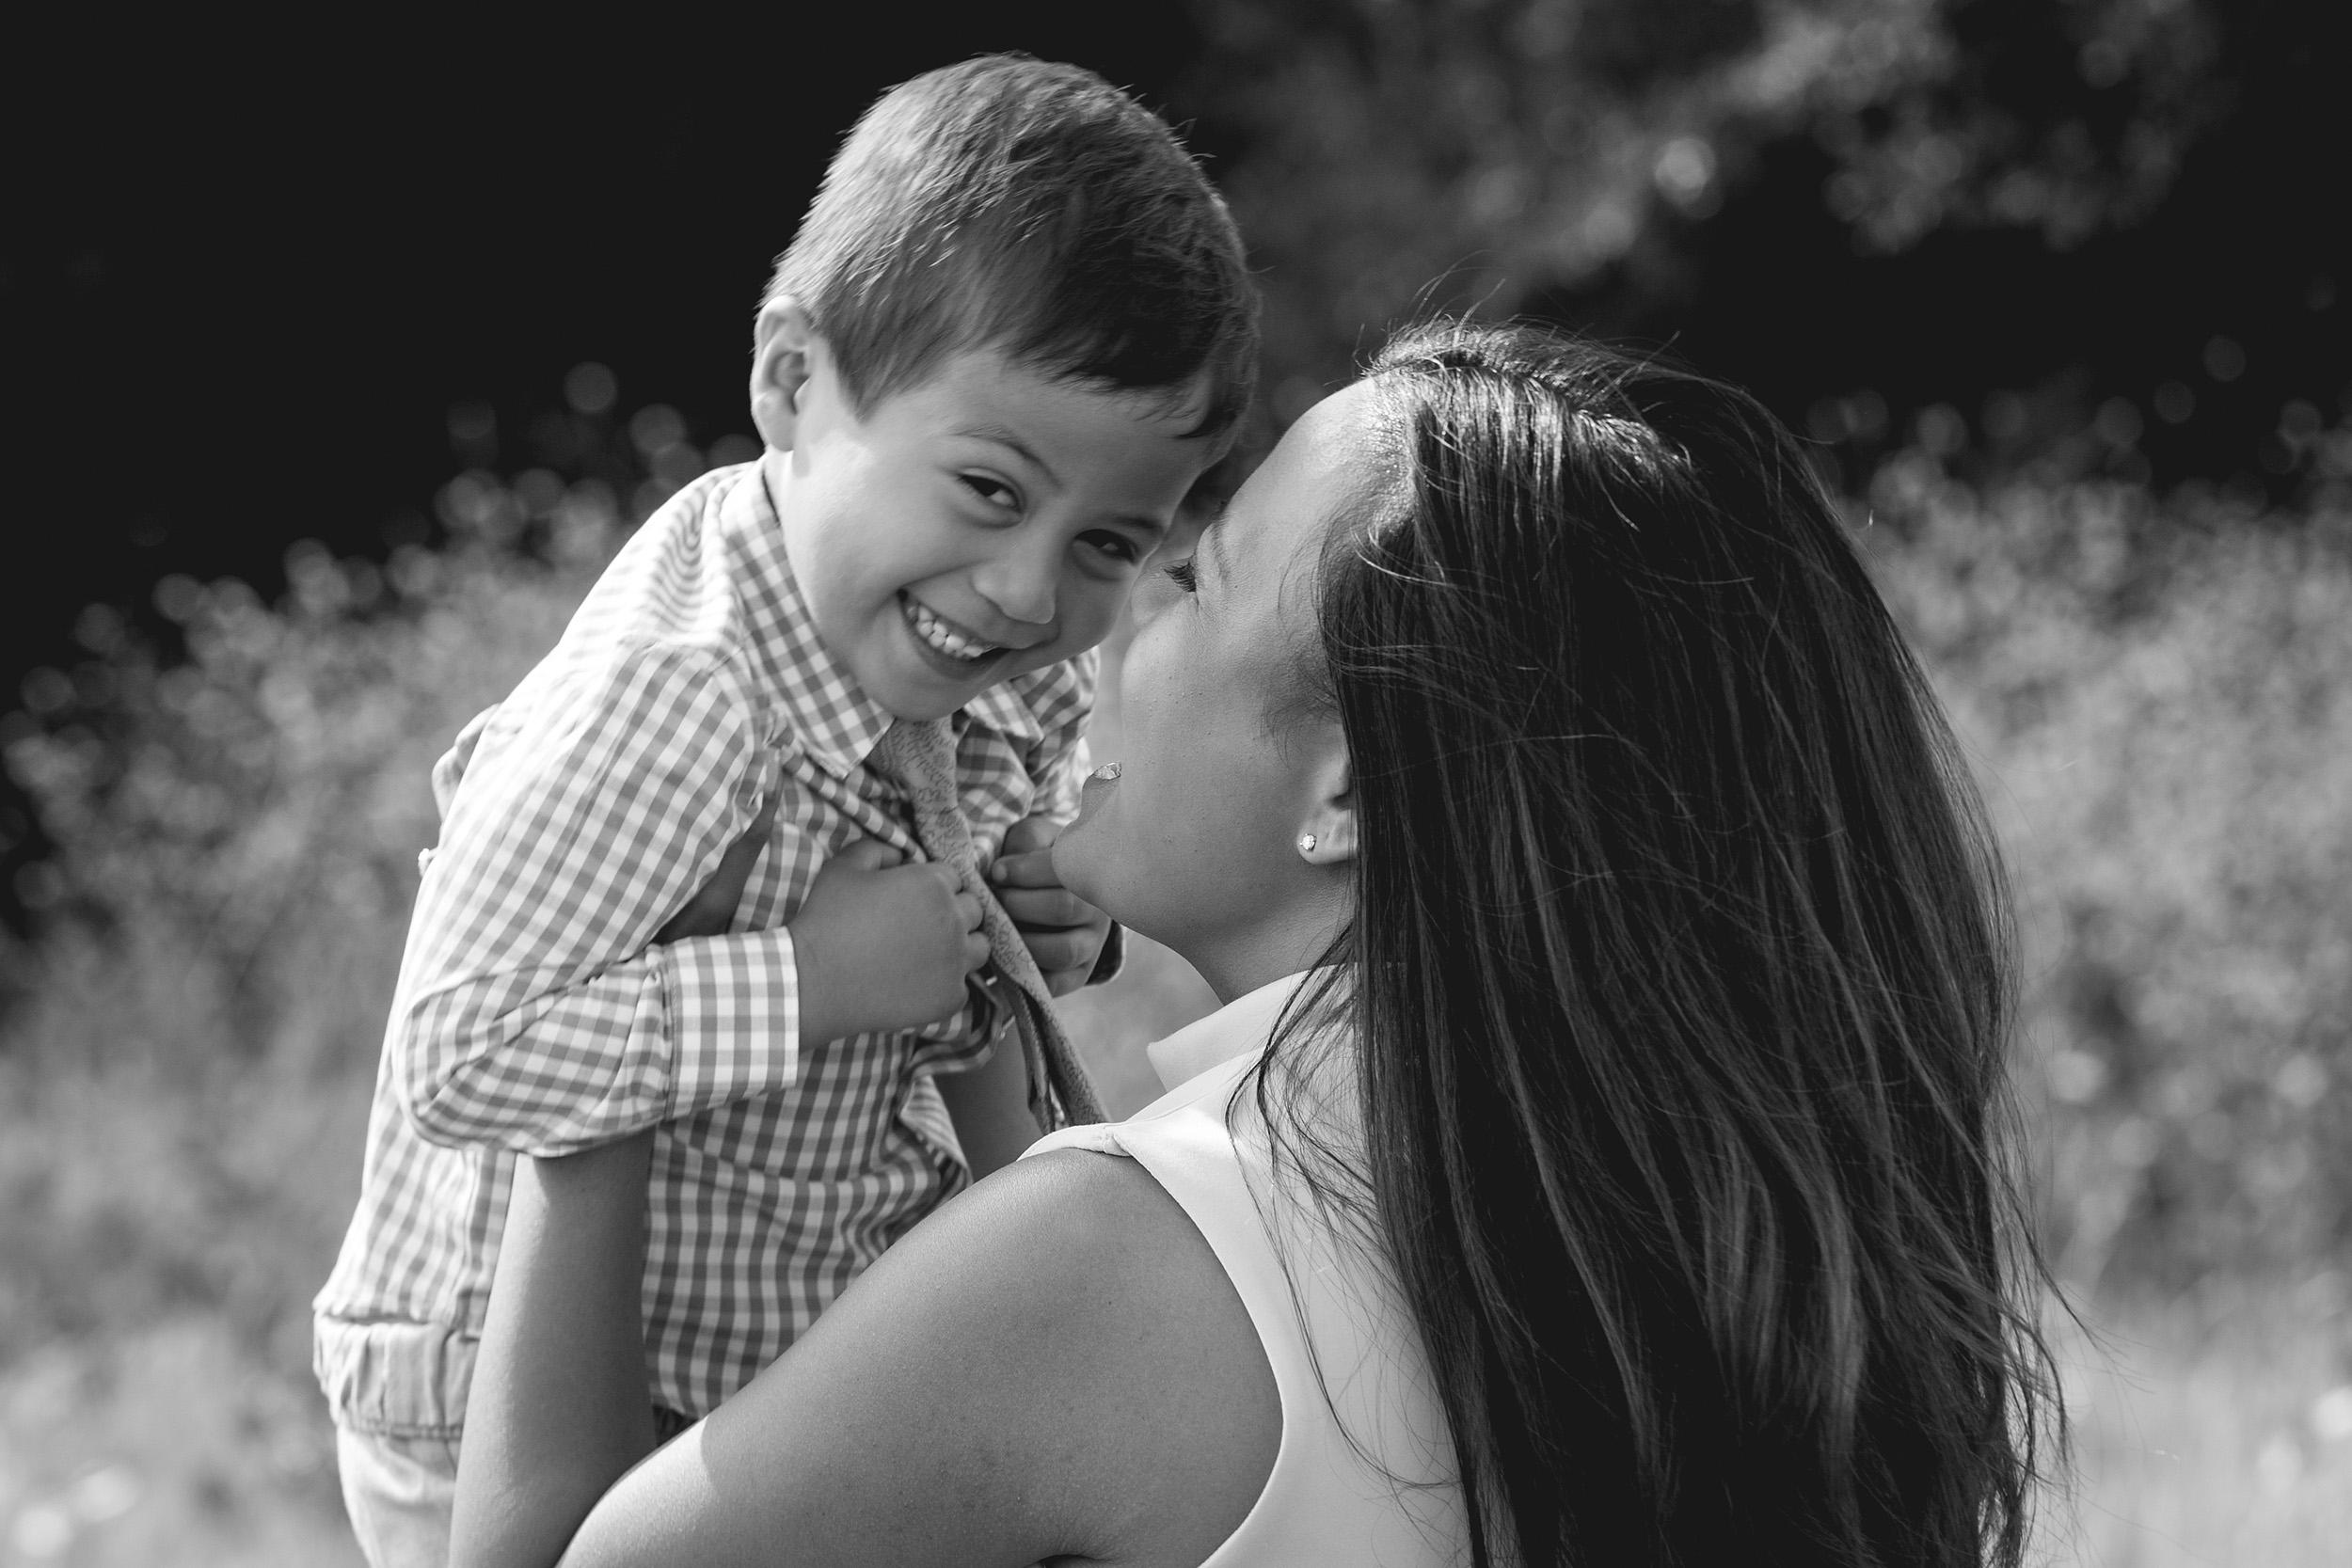 Fernando Family Portraits - 0719 - 20170416 - Scott Madrigal Photography.jpg